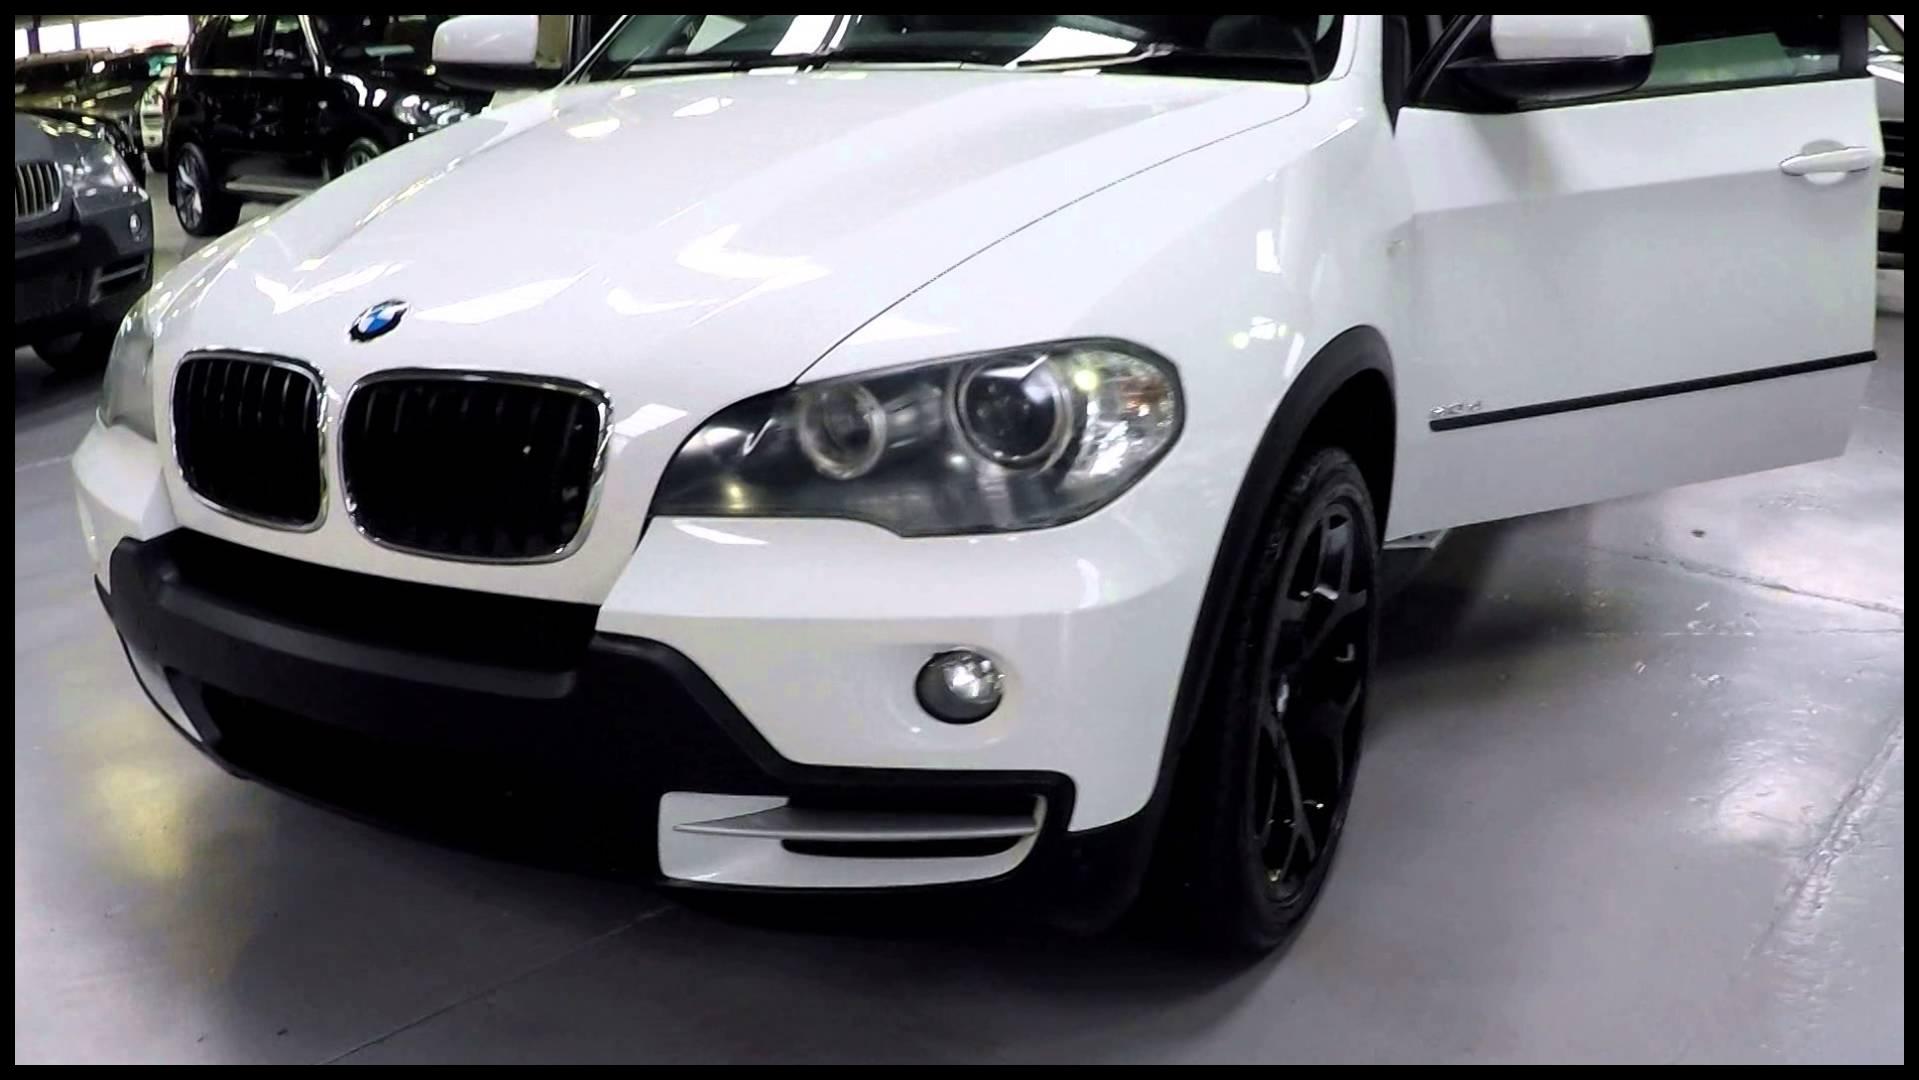 BMW X5 3 0D White 2008 SN